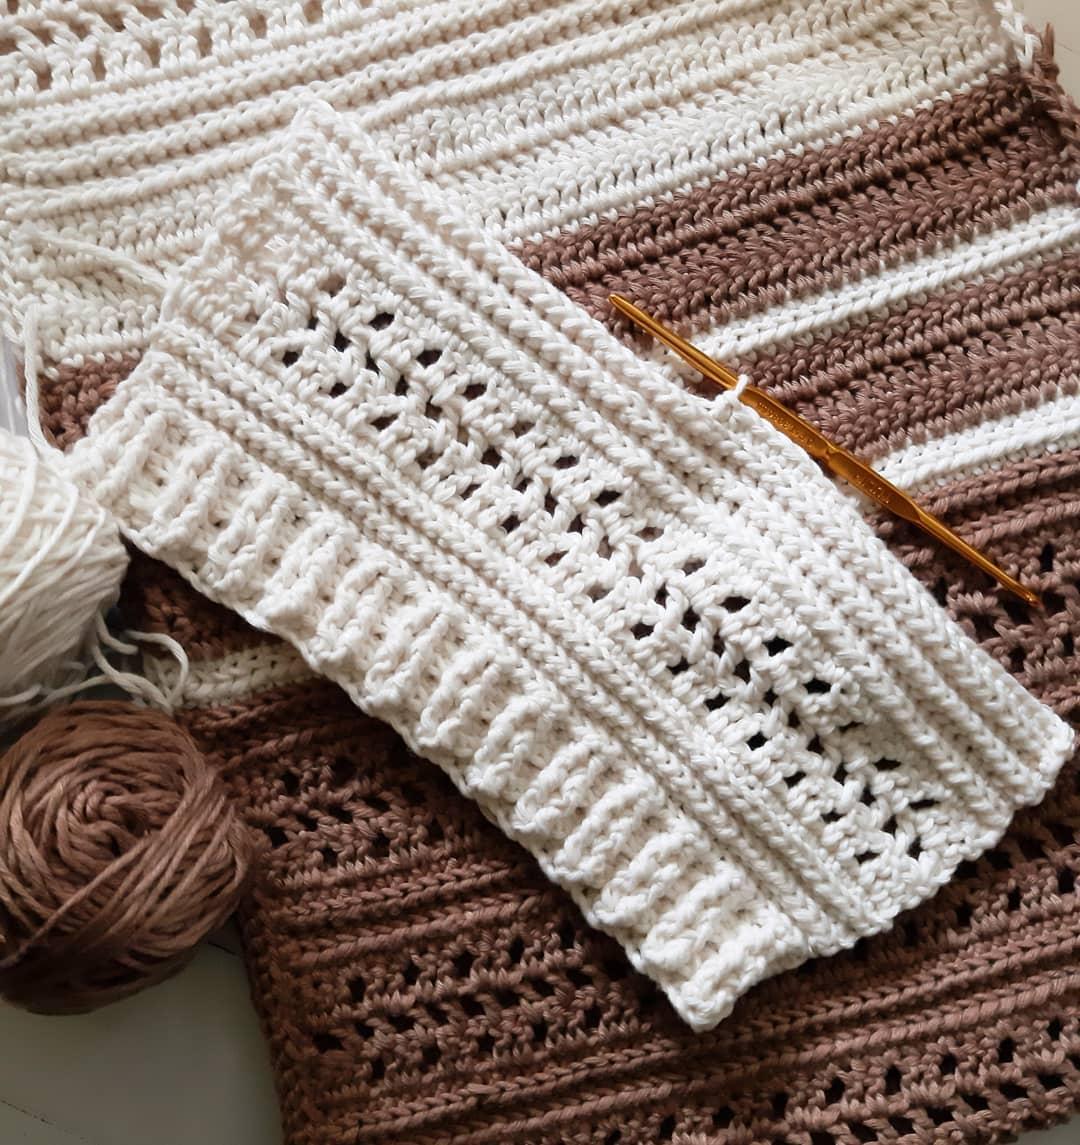 cream crochet piece on brown